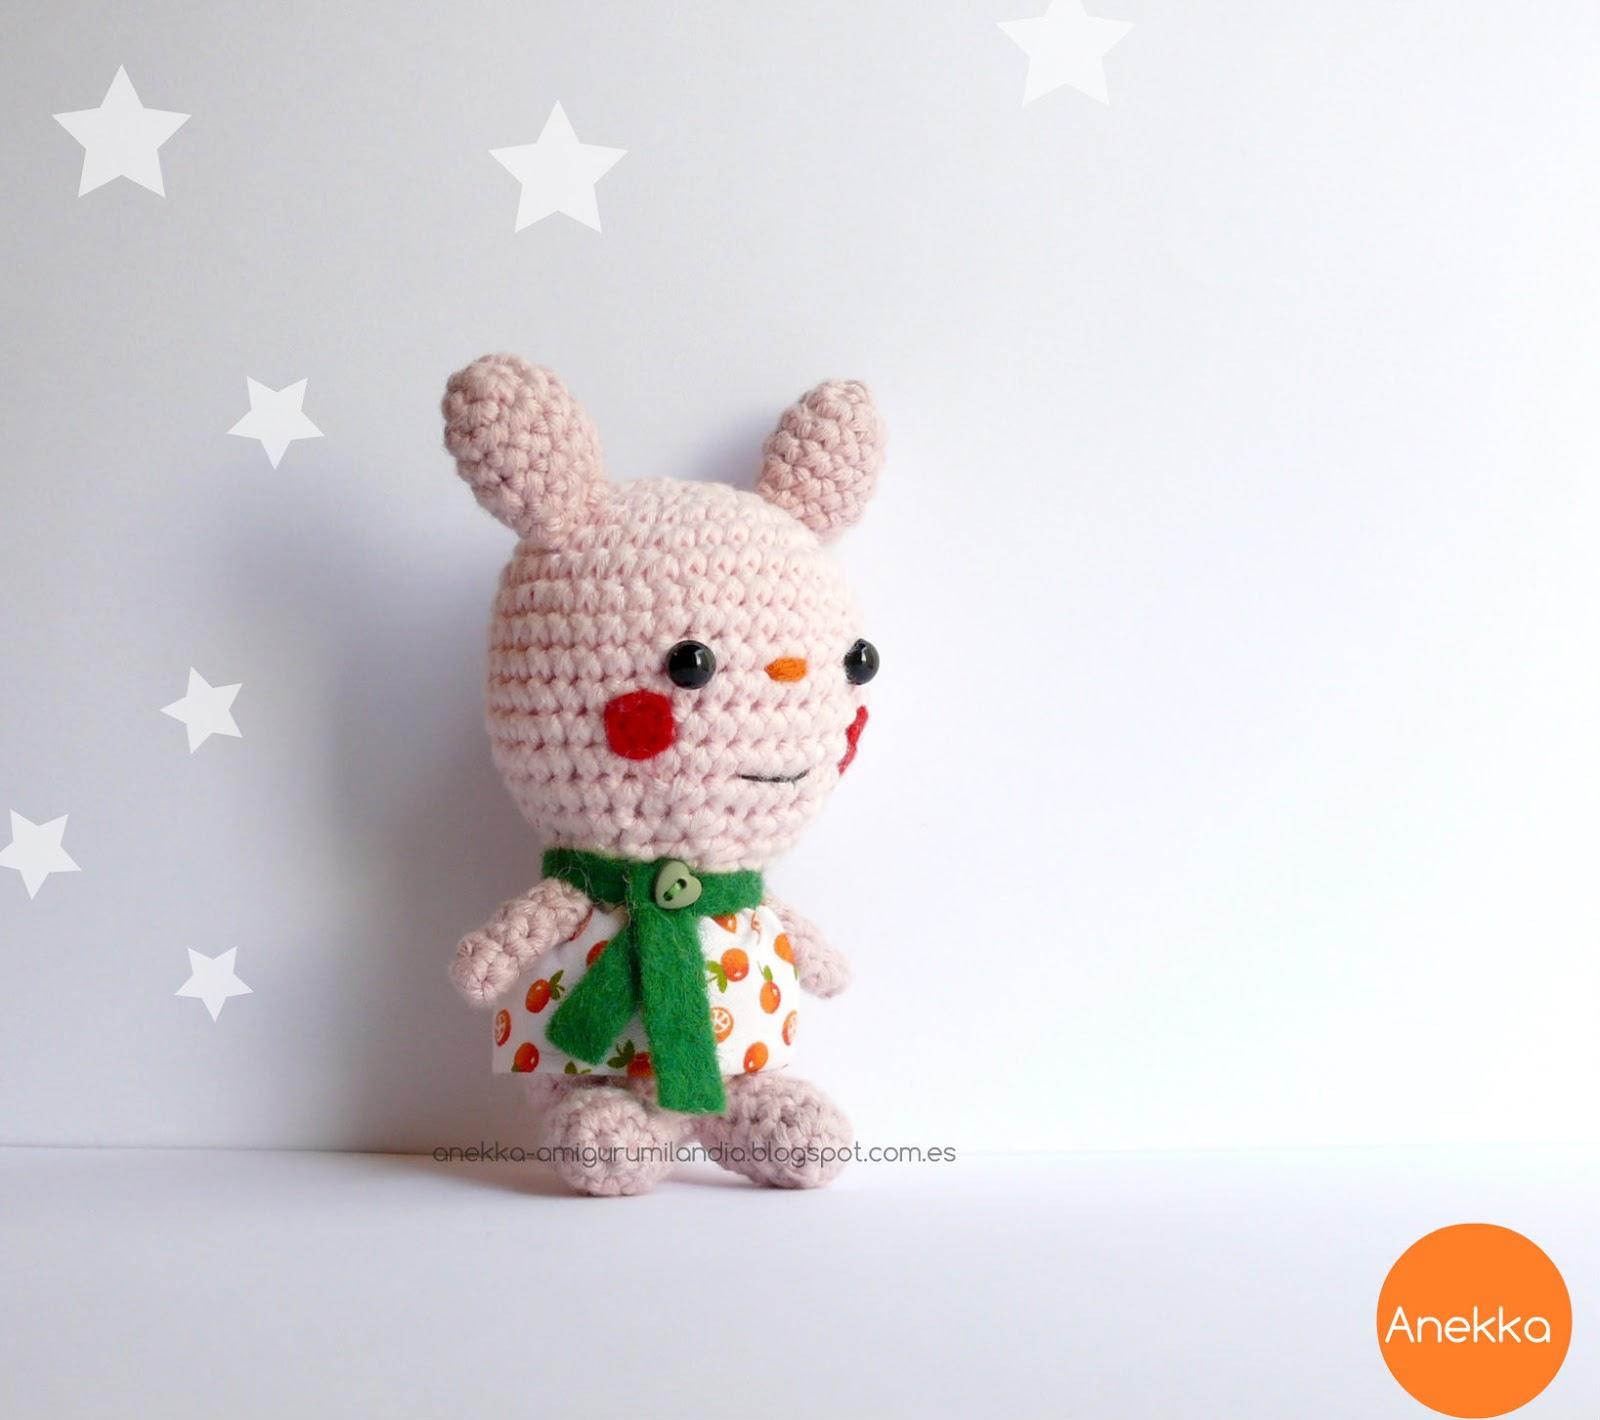 como se hace juguete de crochet?